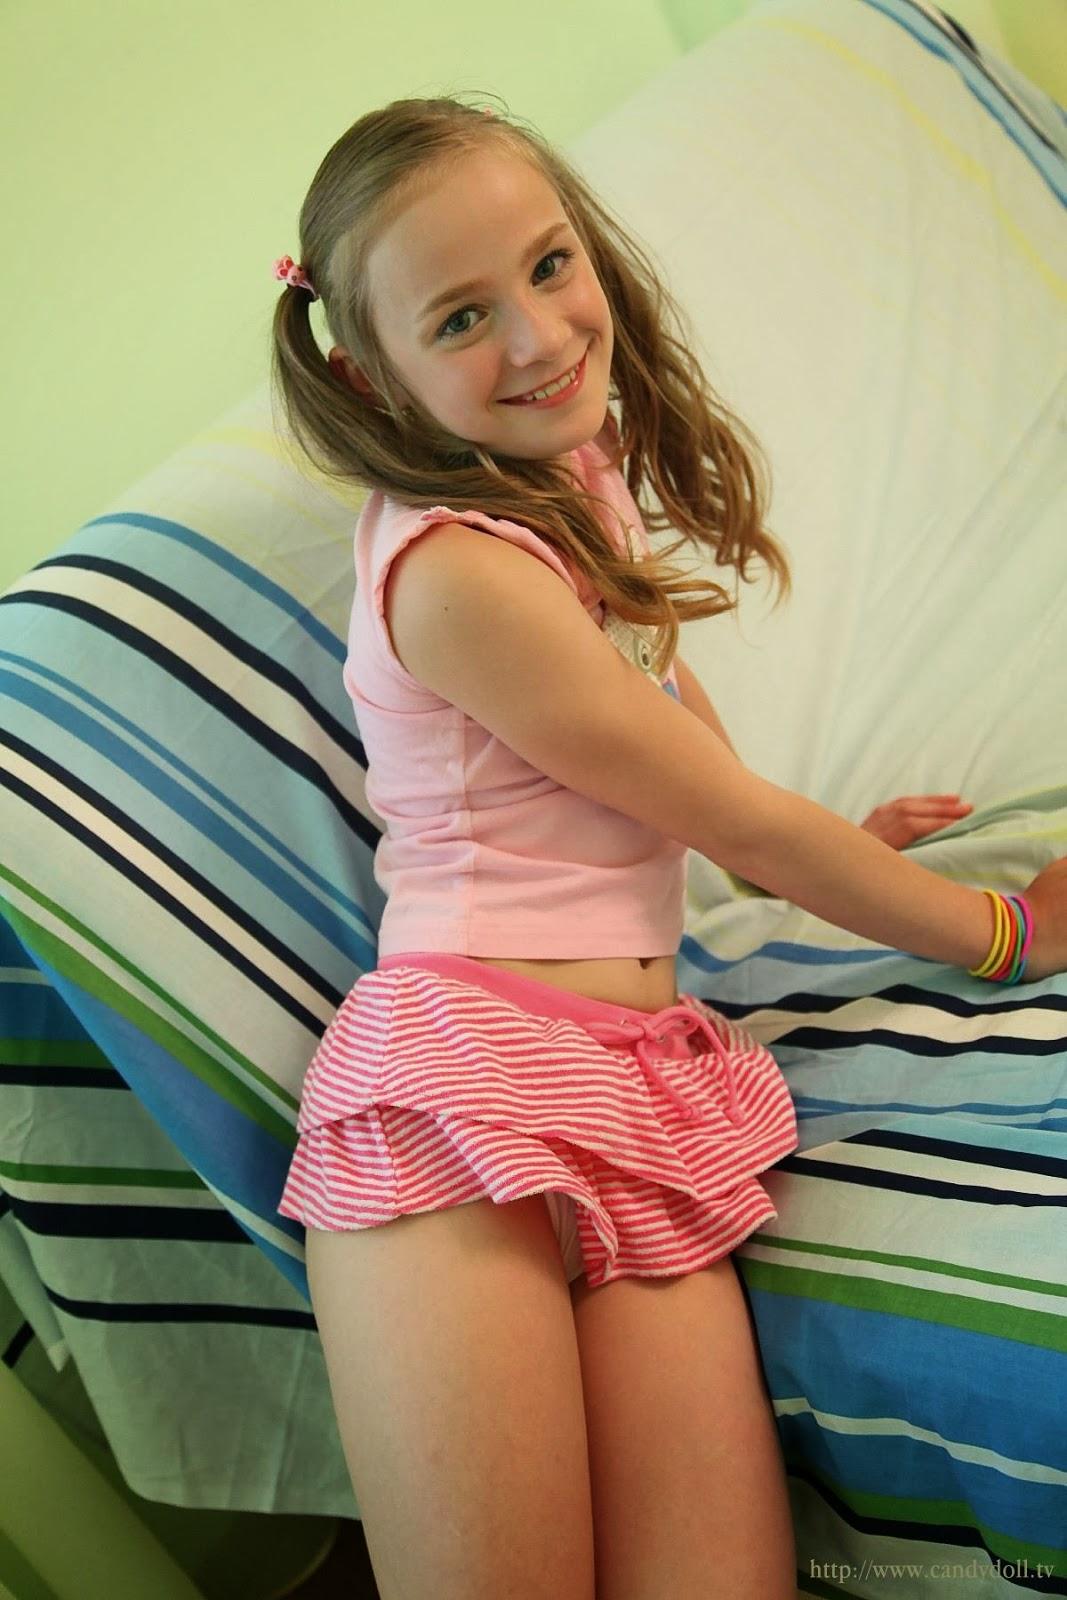 Candydoll Tv Sharlotta S Nude Adanih | Girl Pic